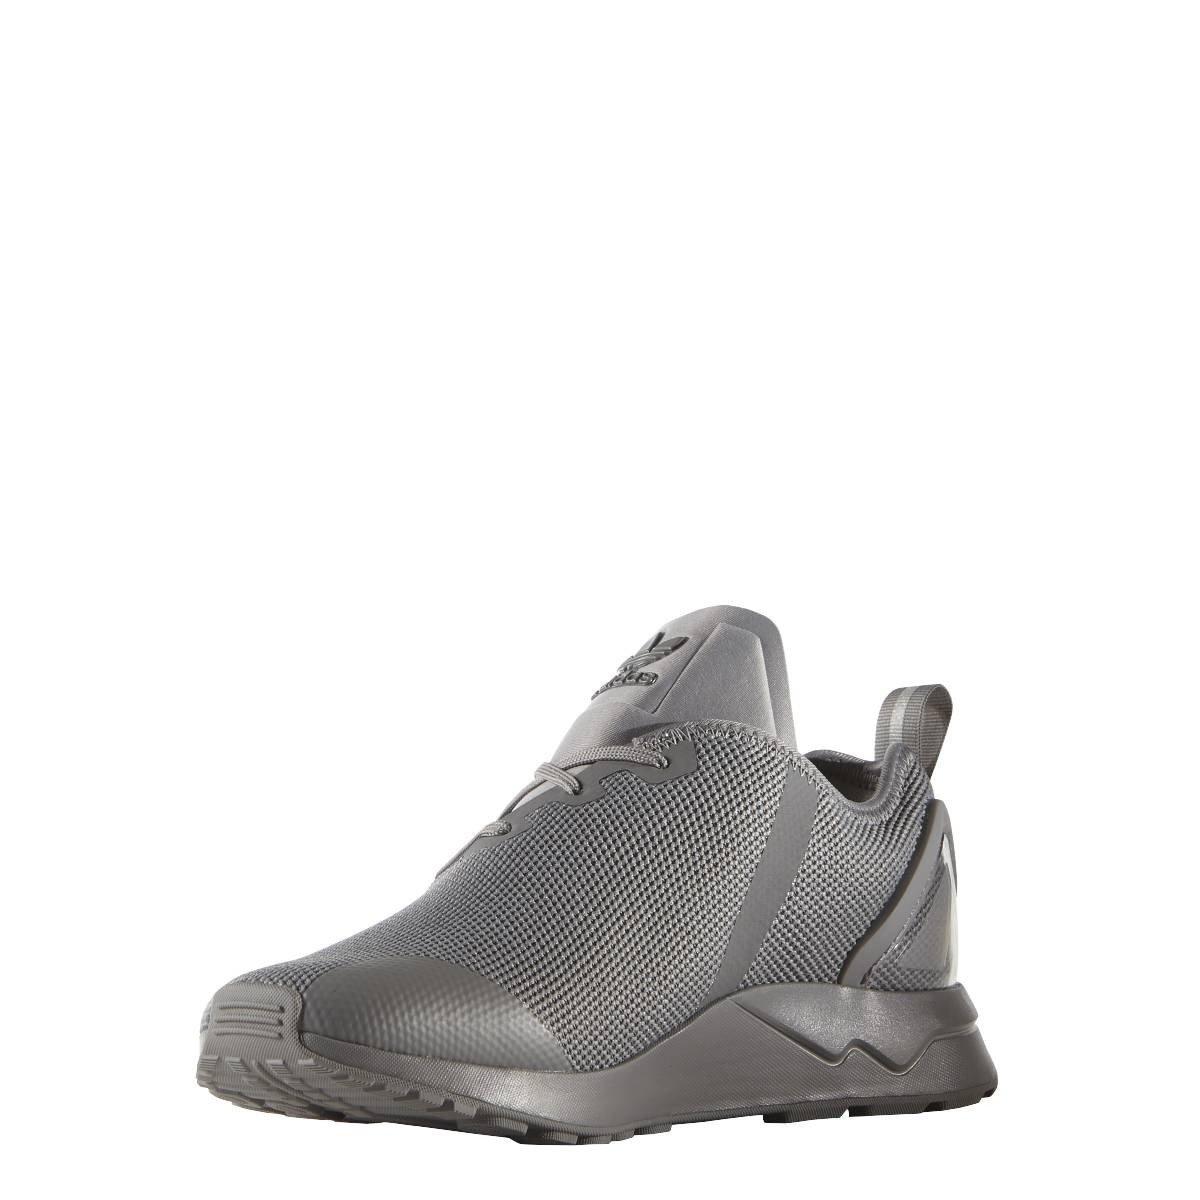 half off db480 3378b adidas Zx Flux Adv Trainers Grey